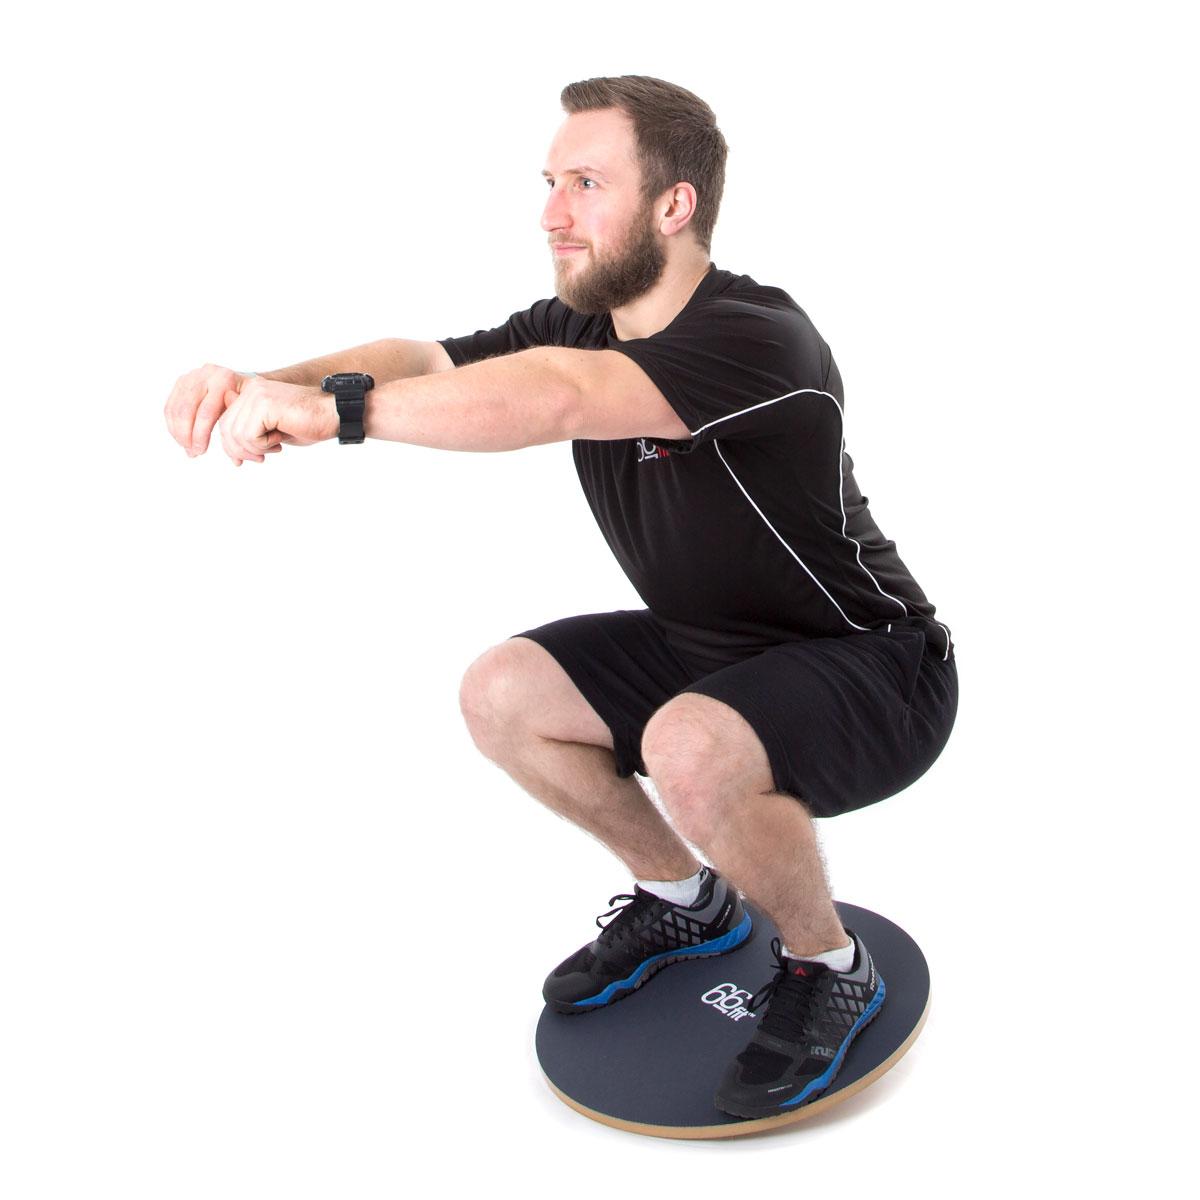 Balance Board Exercises For Knee: Rocker Boards And Balance Boards / Wobble Boards